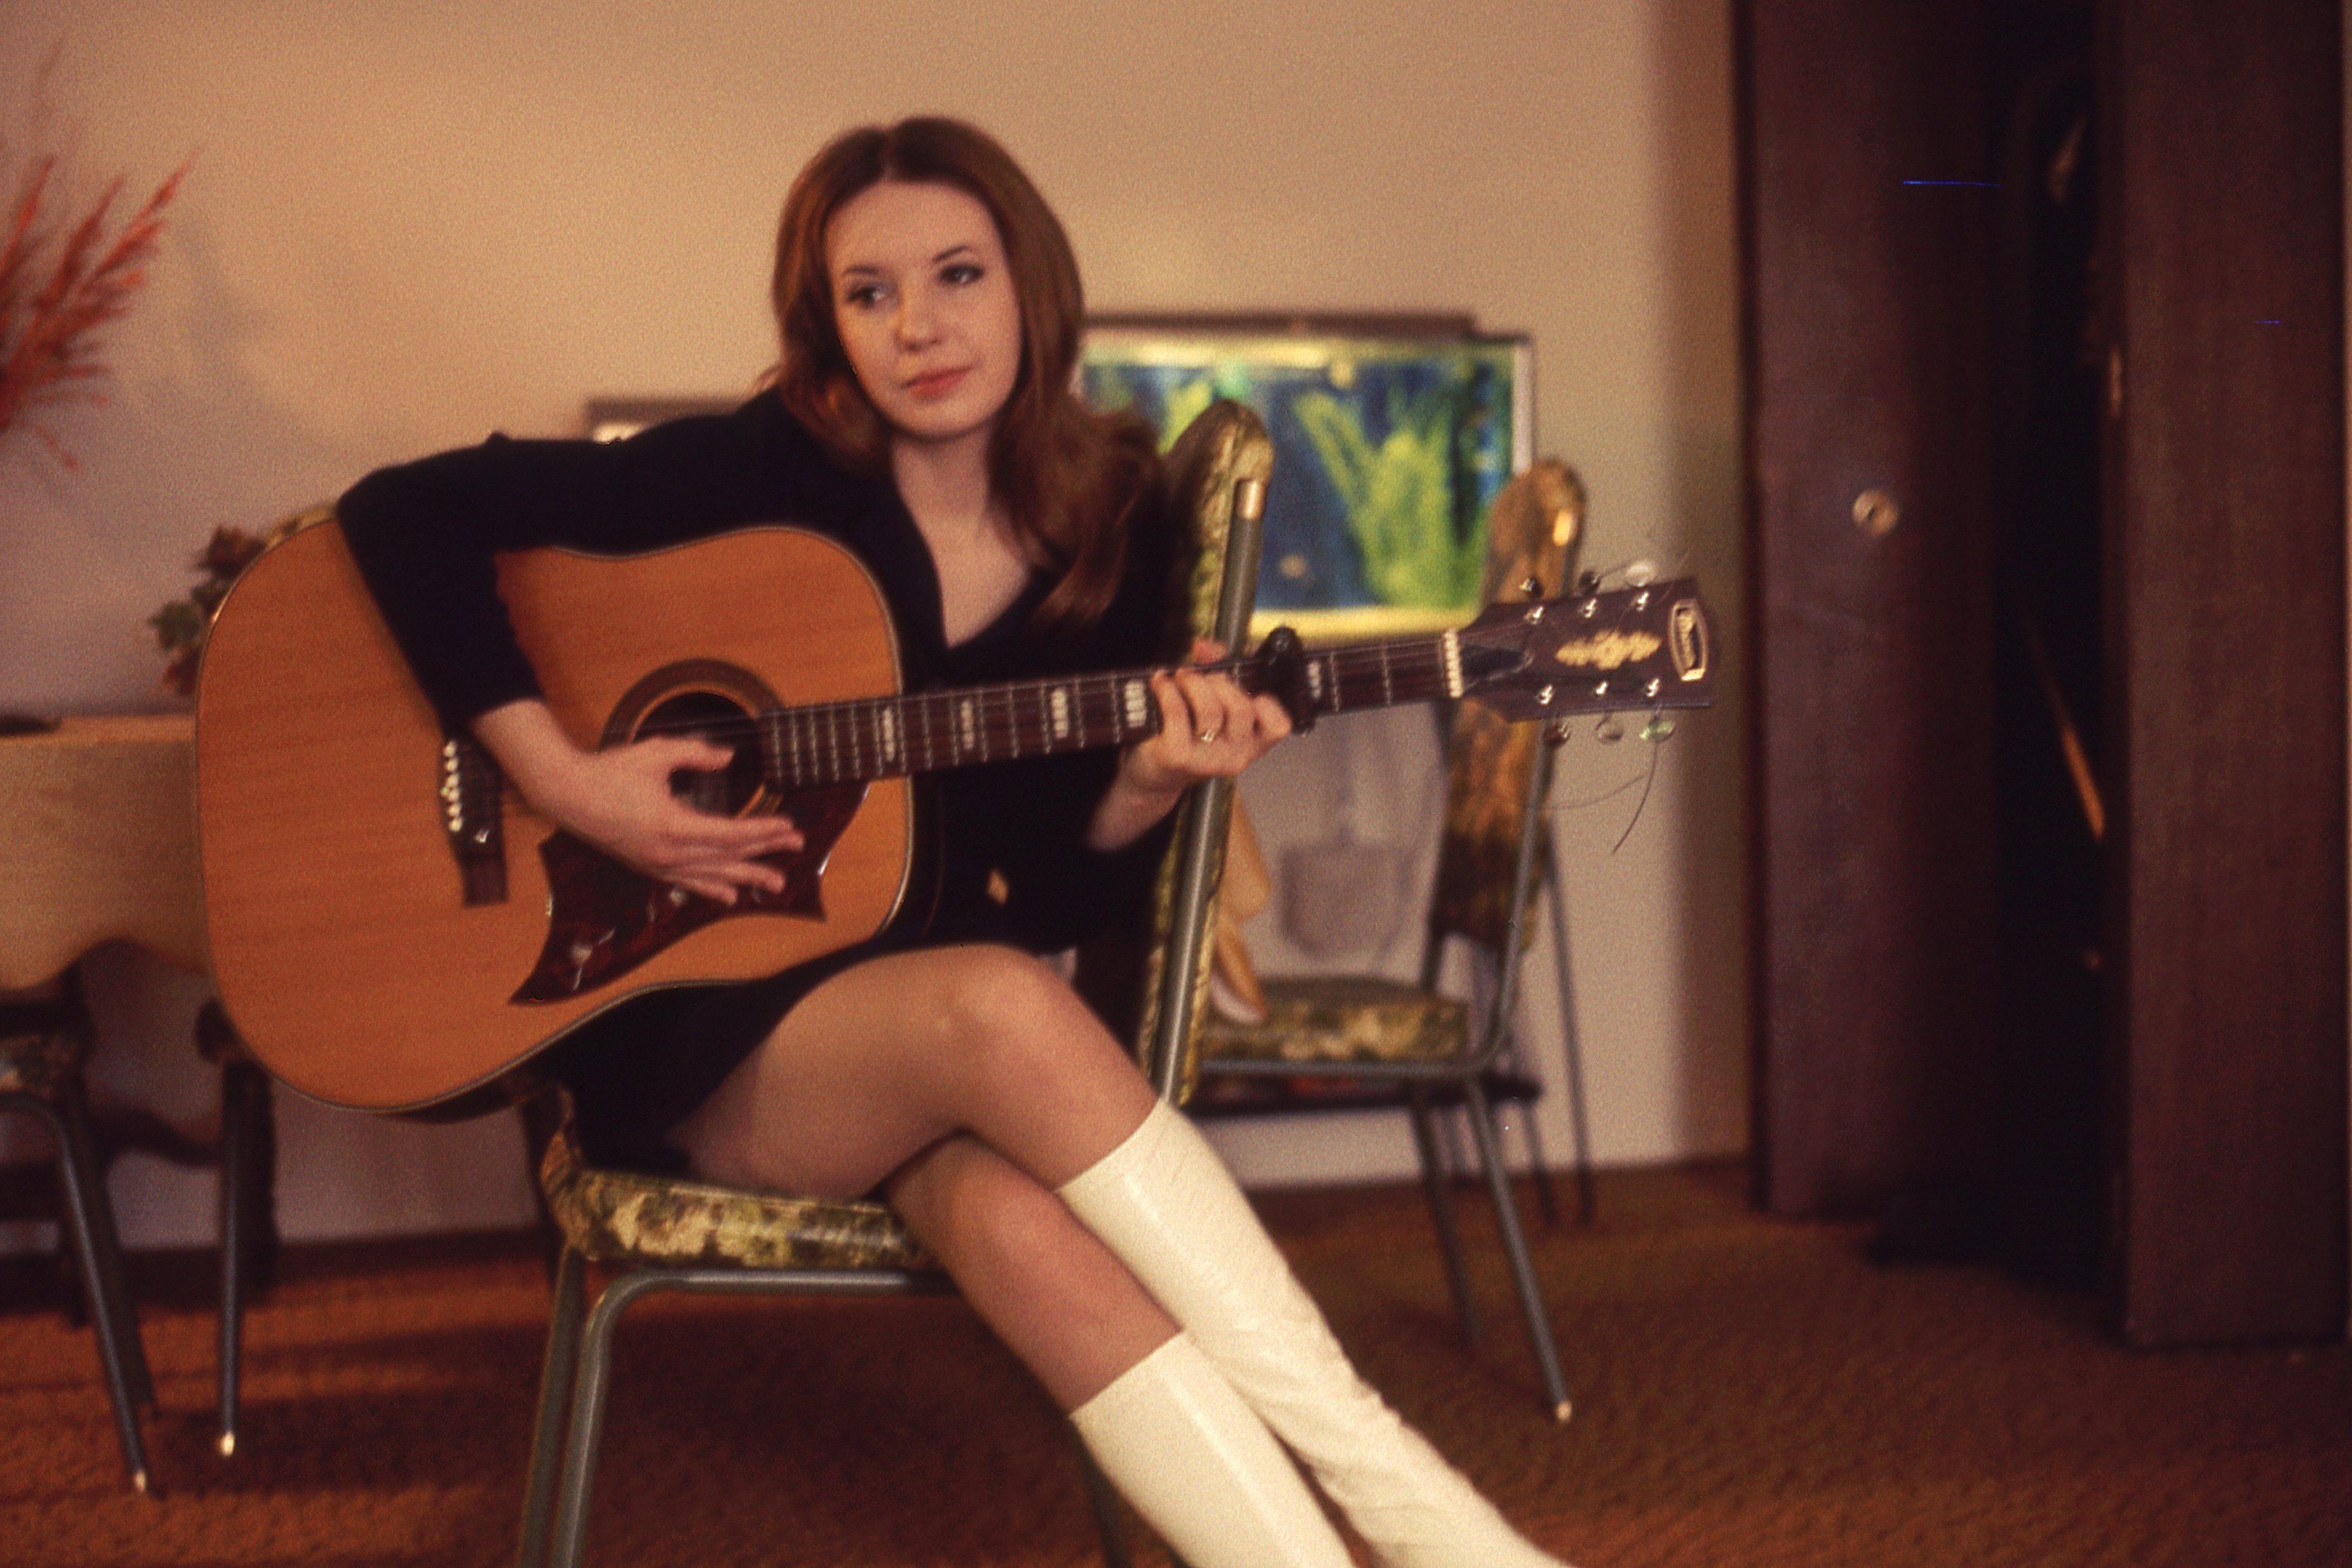 guitar po girl shines